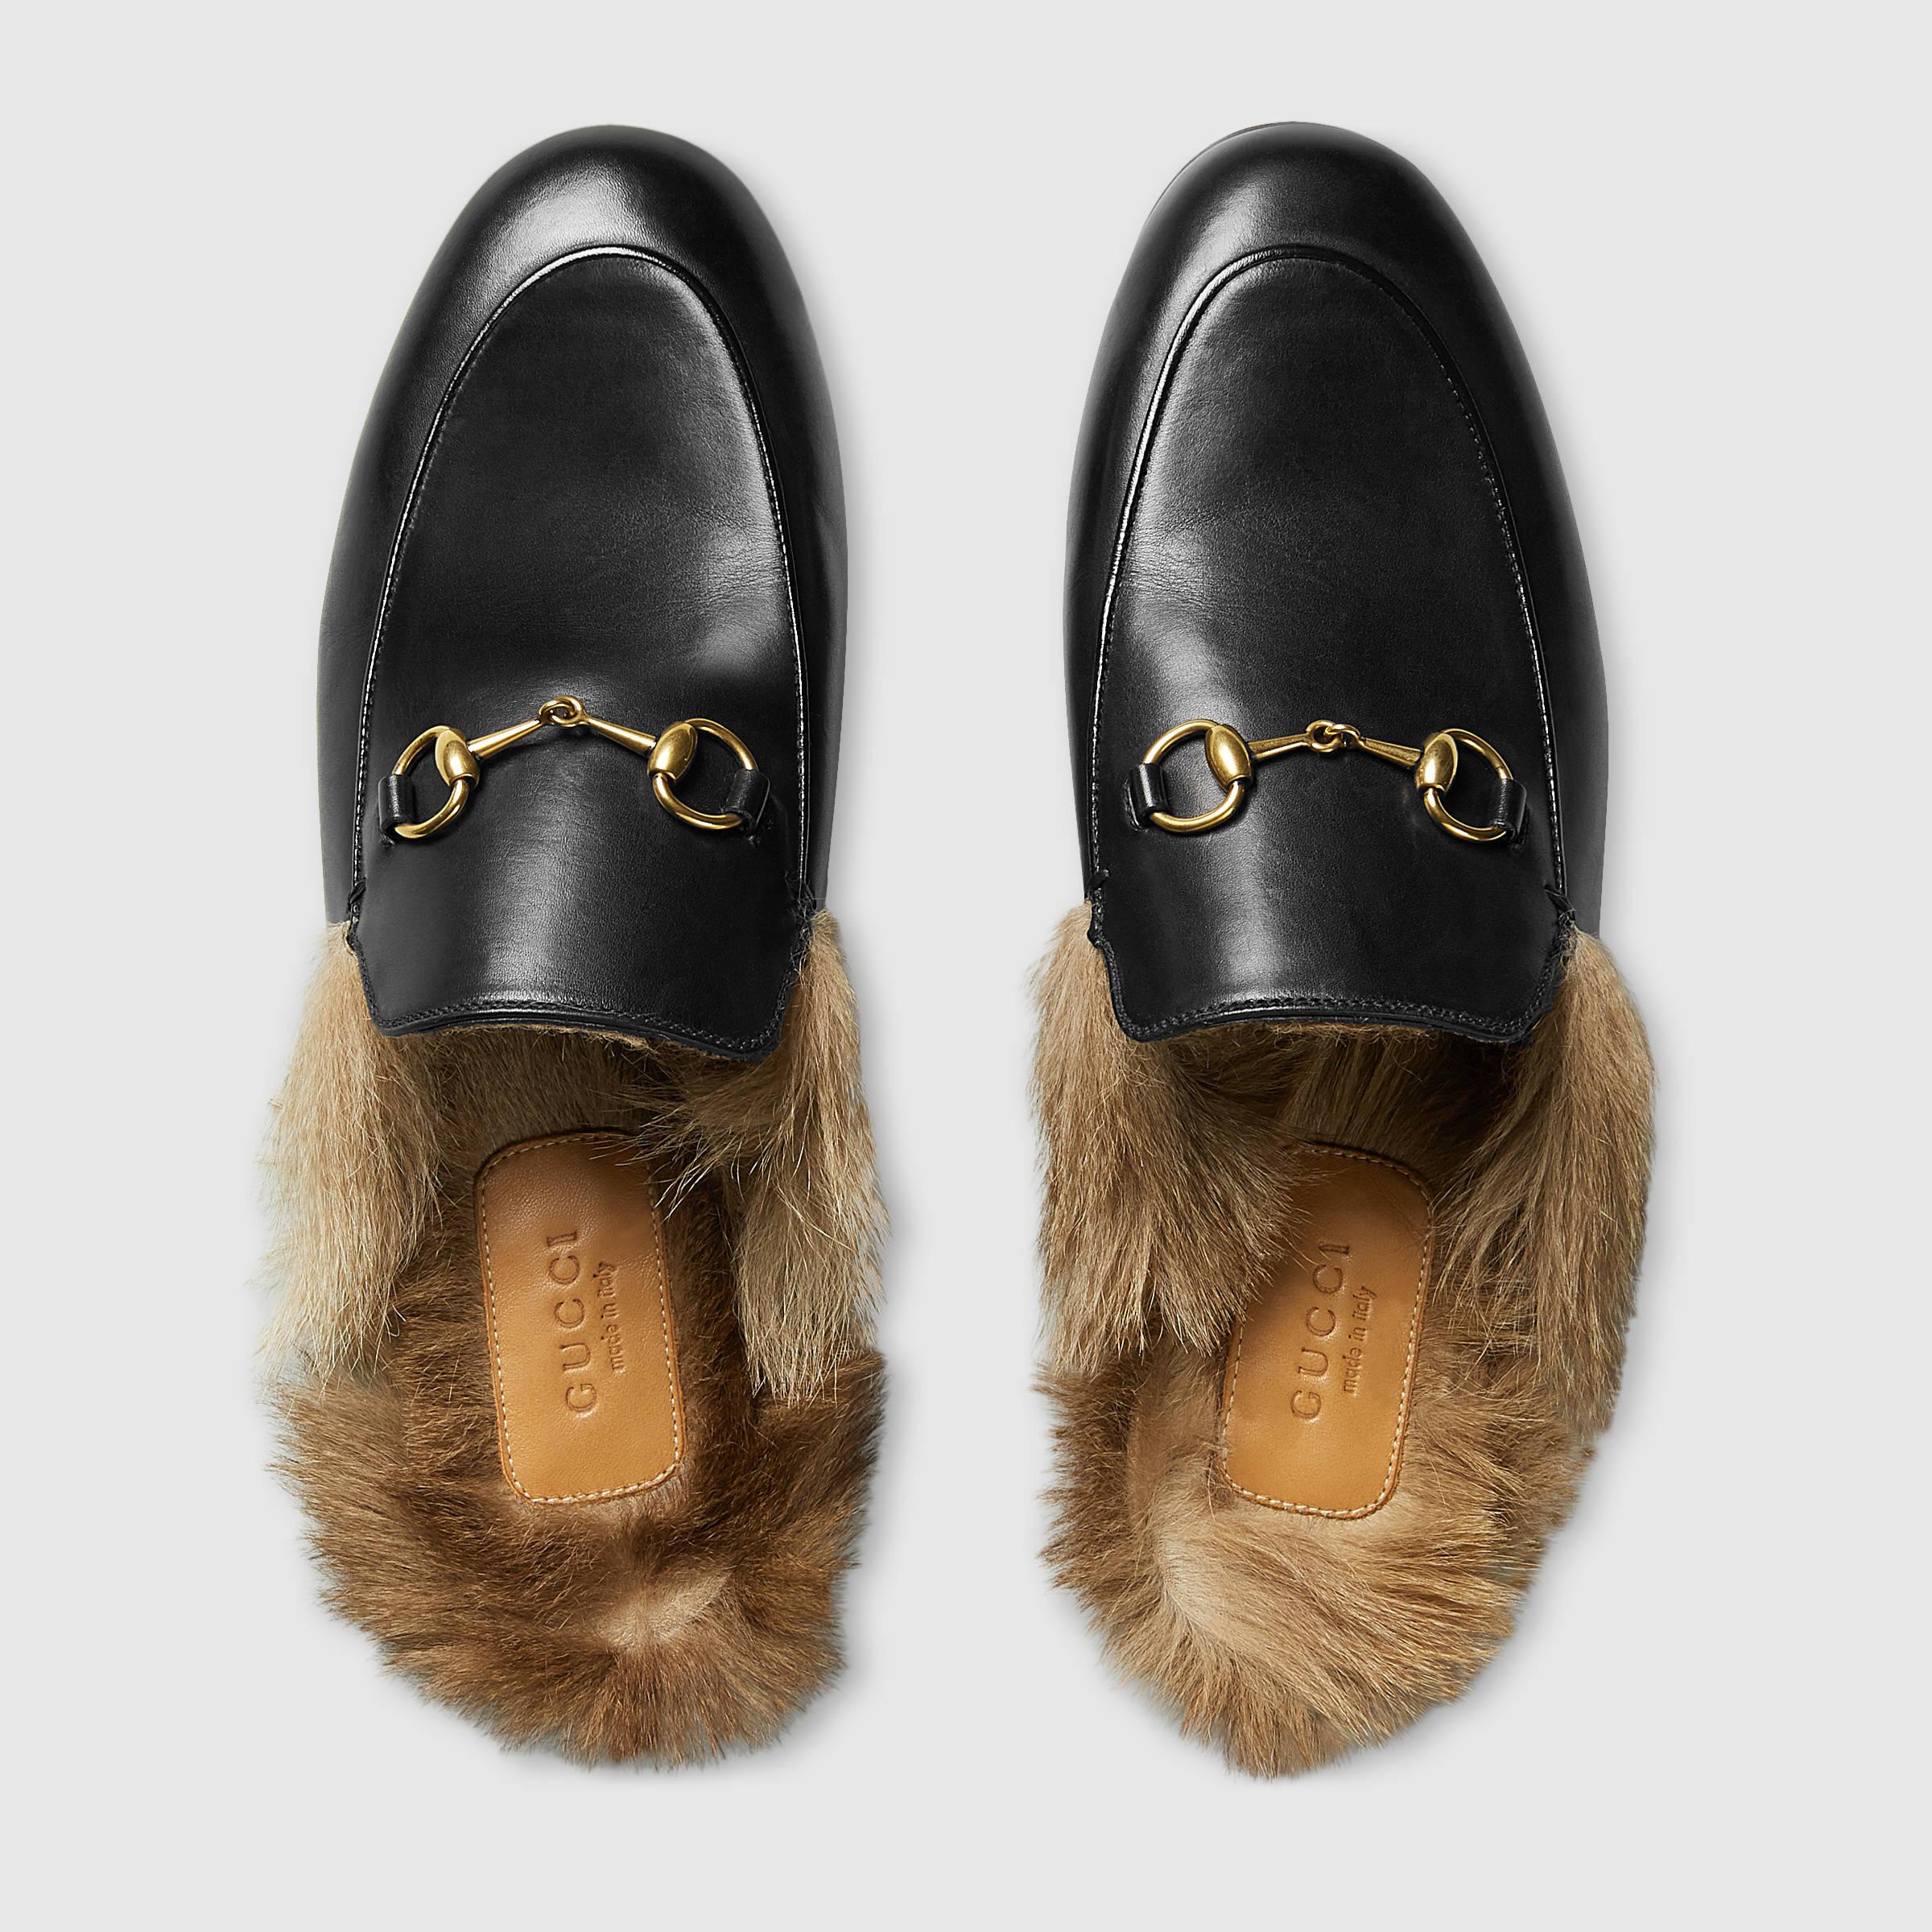 397749_dkh20_1063_003_100_0000_light-princetown-leather-slipper